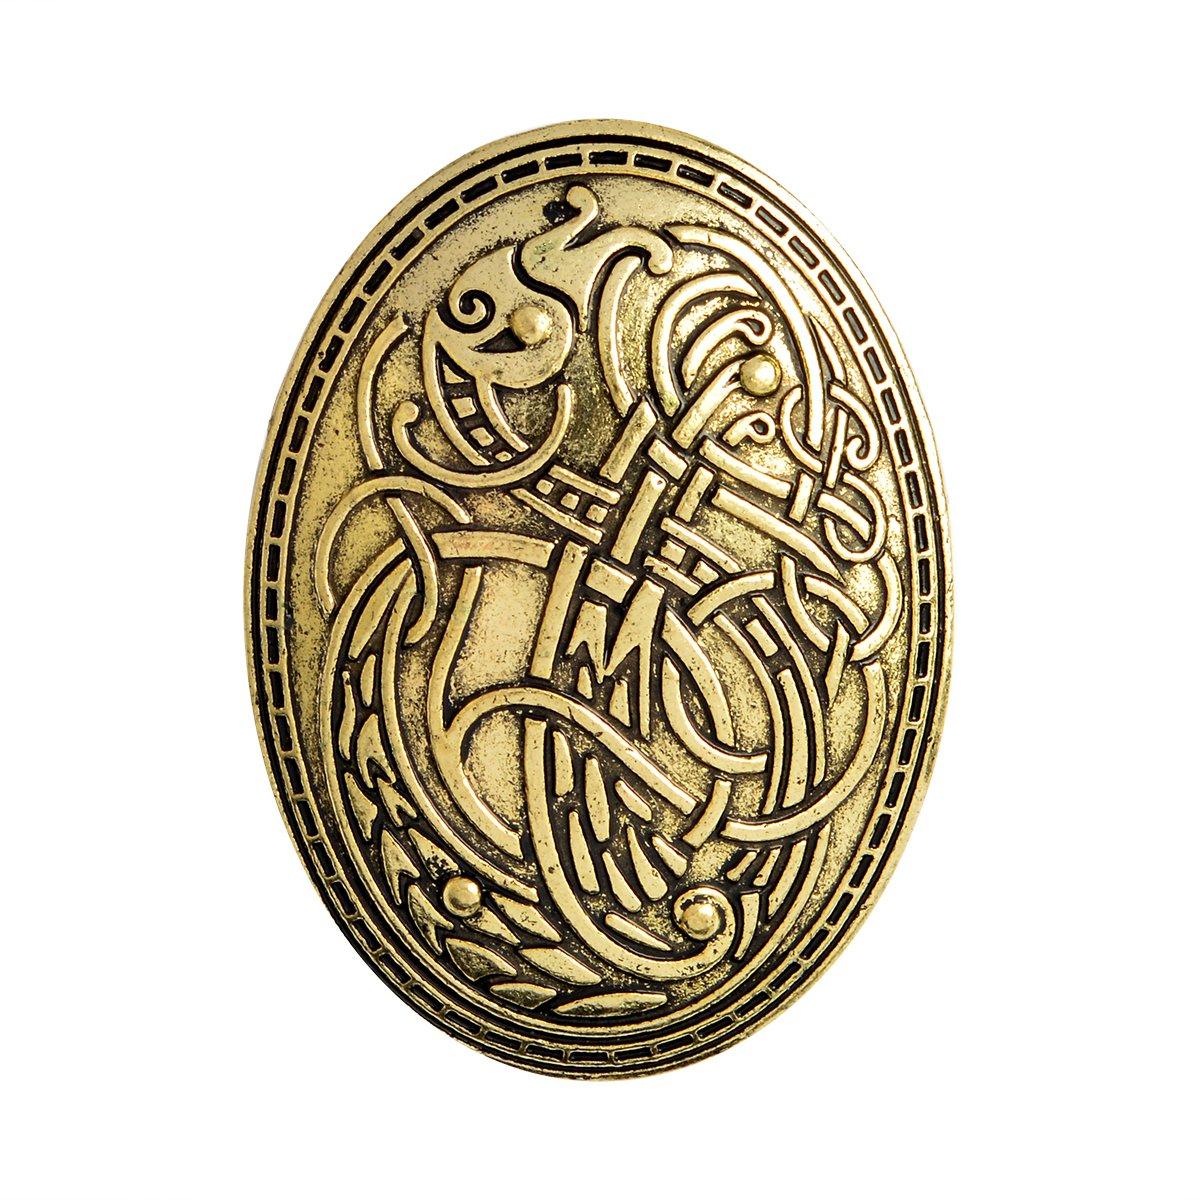 Fenteer Retro Viking Buckle Clasp Clothes Cloak Pin Penannular Brooch Norse Fibula Celtic Brooch Pins